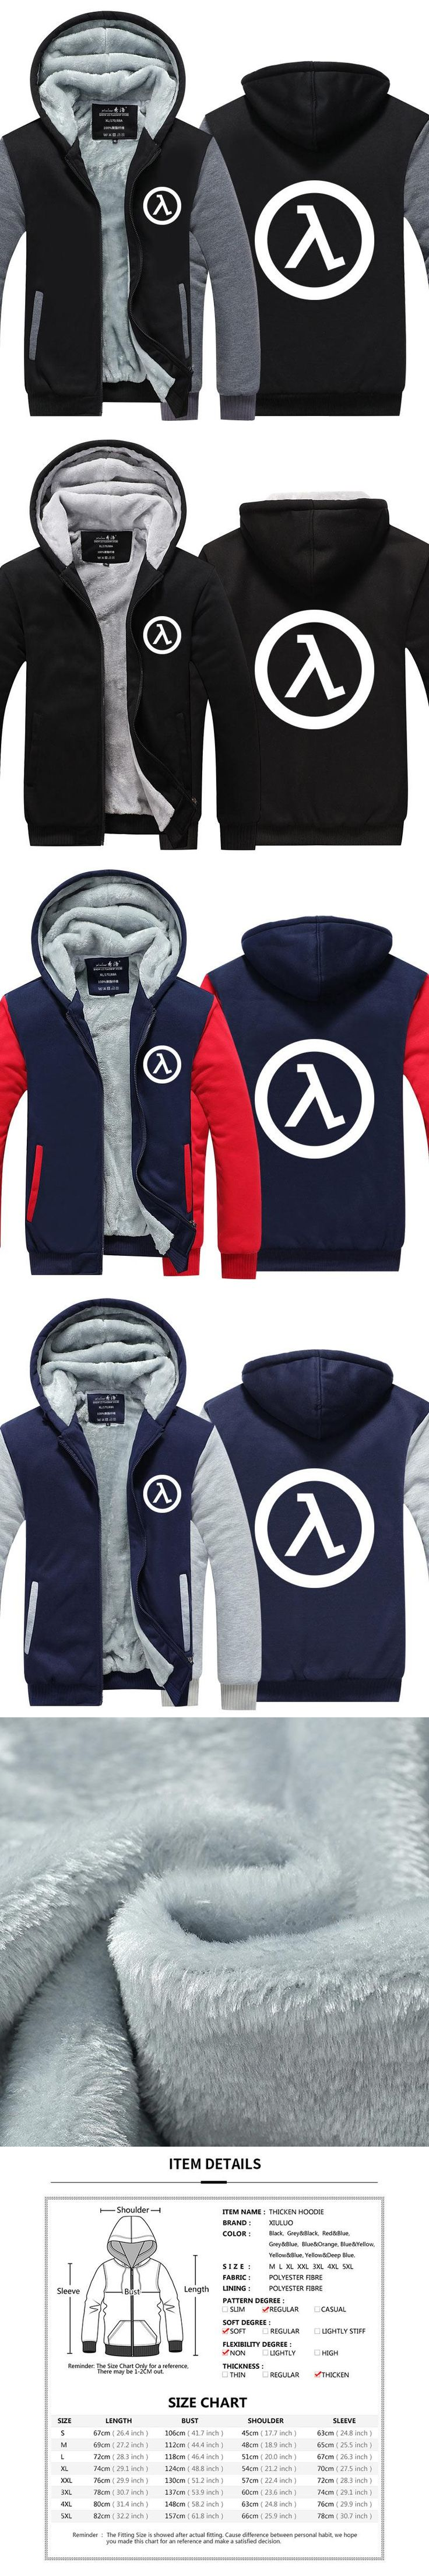 Mens Game Hoodie Half Life FPS video game Jacket Thicken Fleece Hoodie Winter Zipper Coat US EU Plus Size